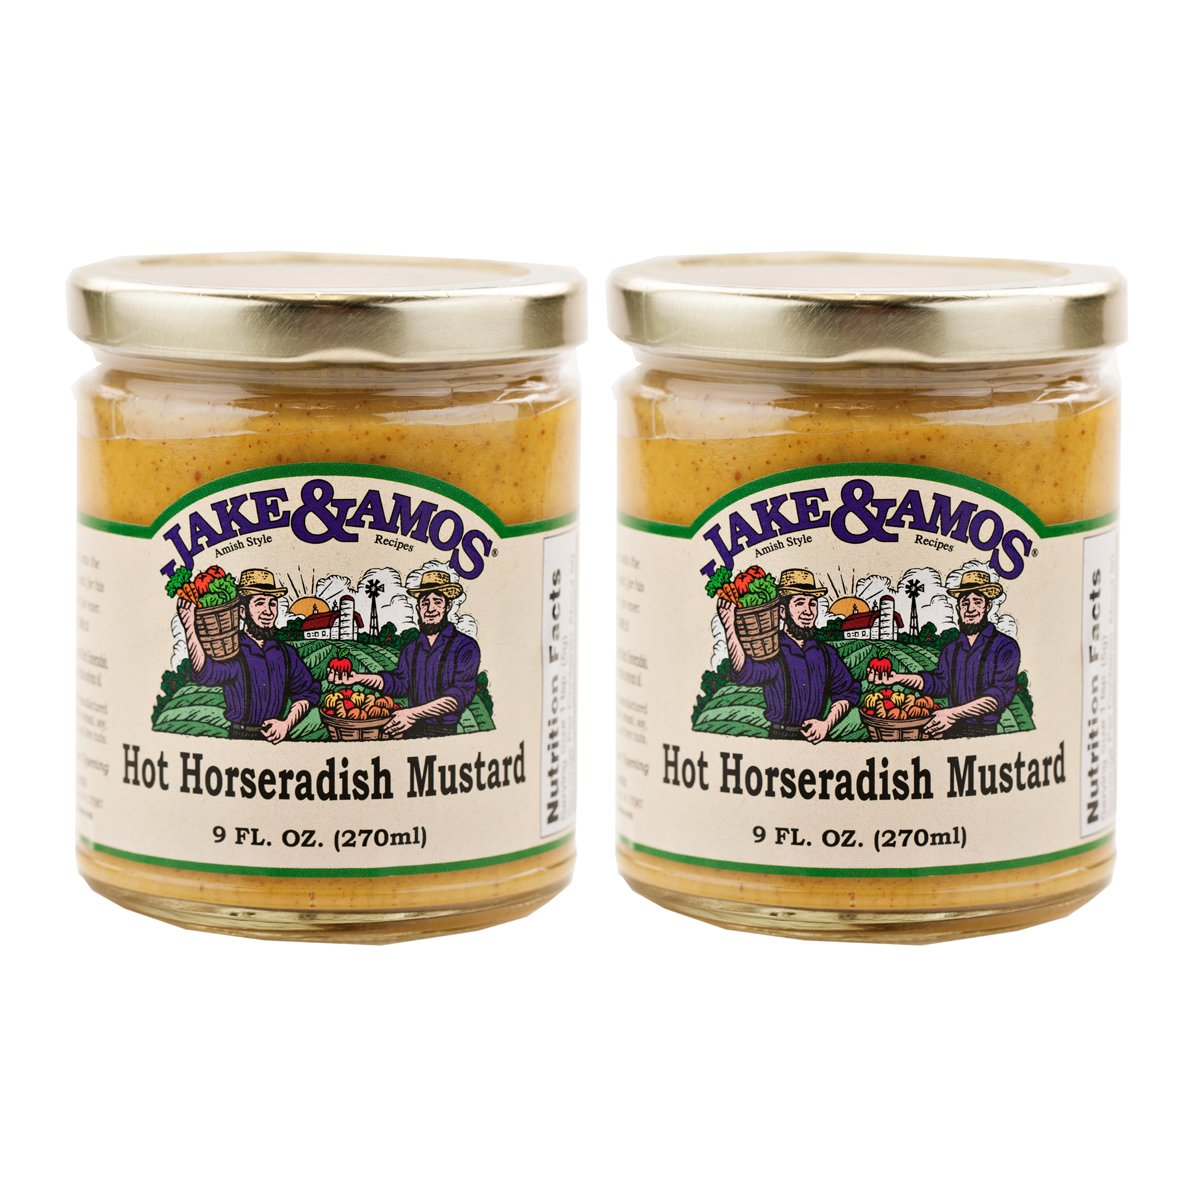 Jake & Amos Hot Horseradish Mustard / 2 - 9 Oz. Jars by Jake & Amos